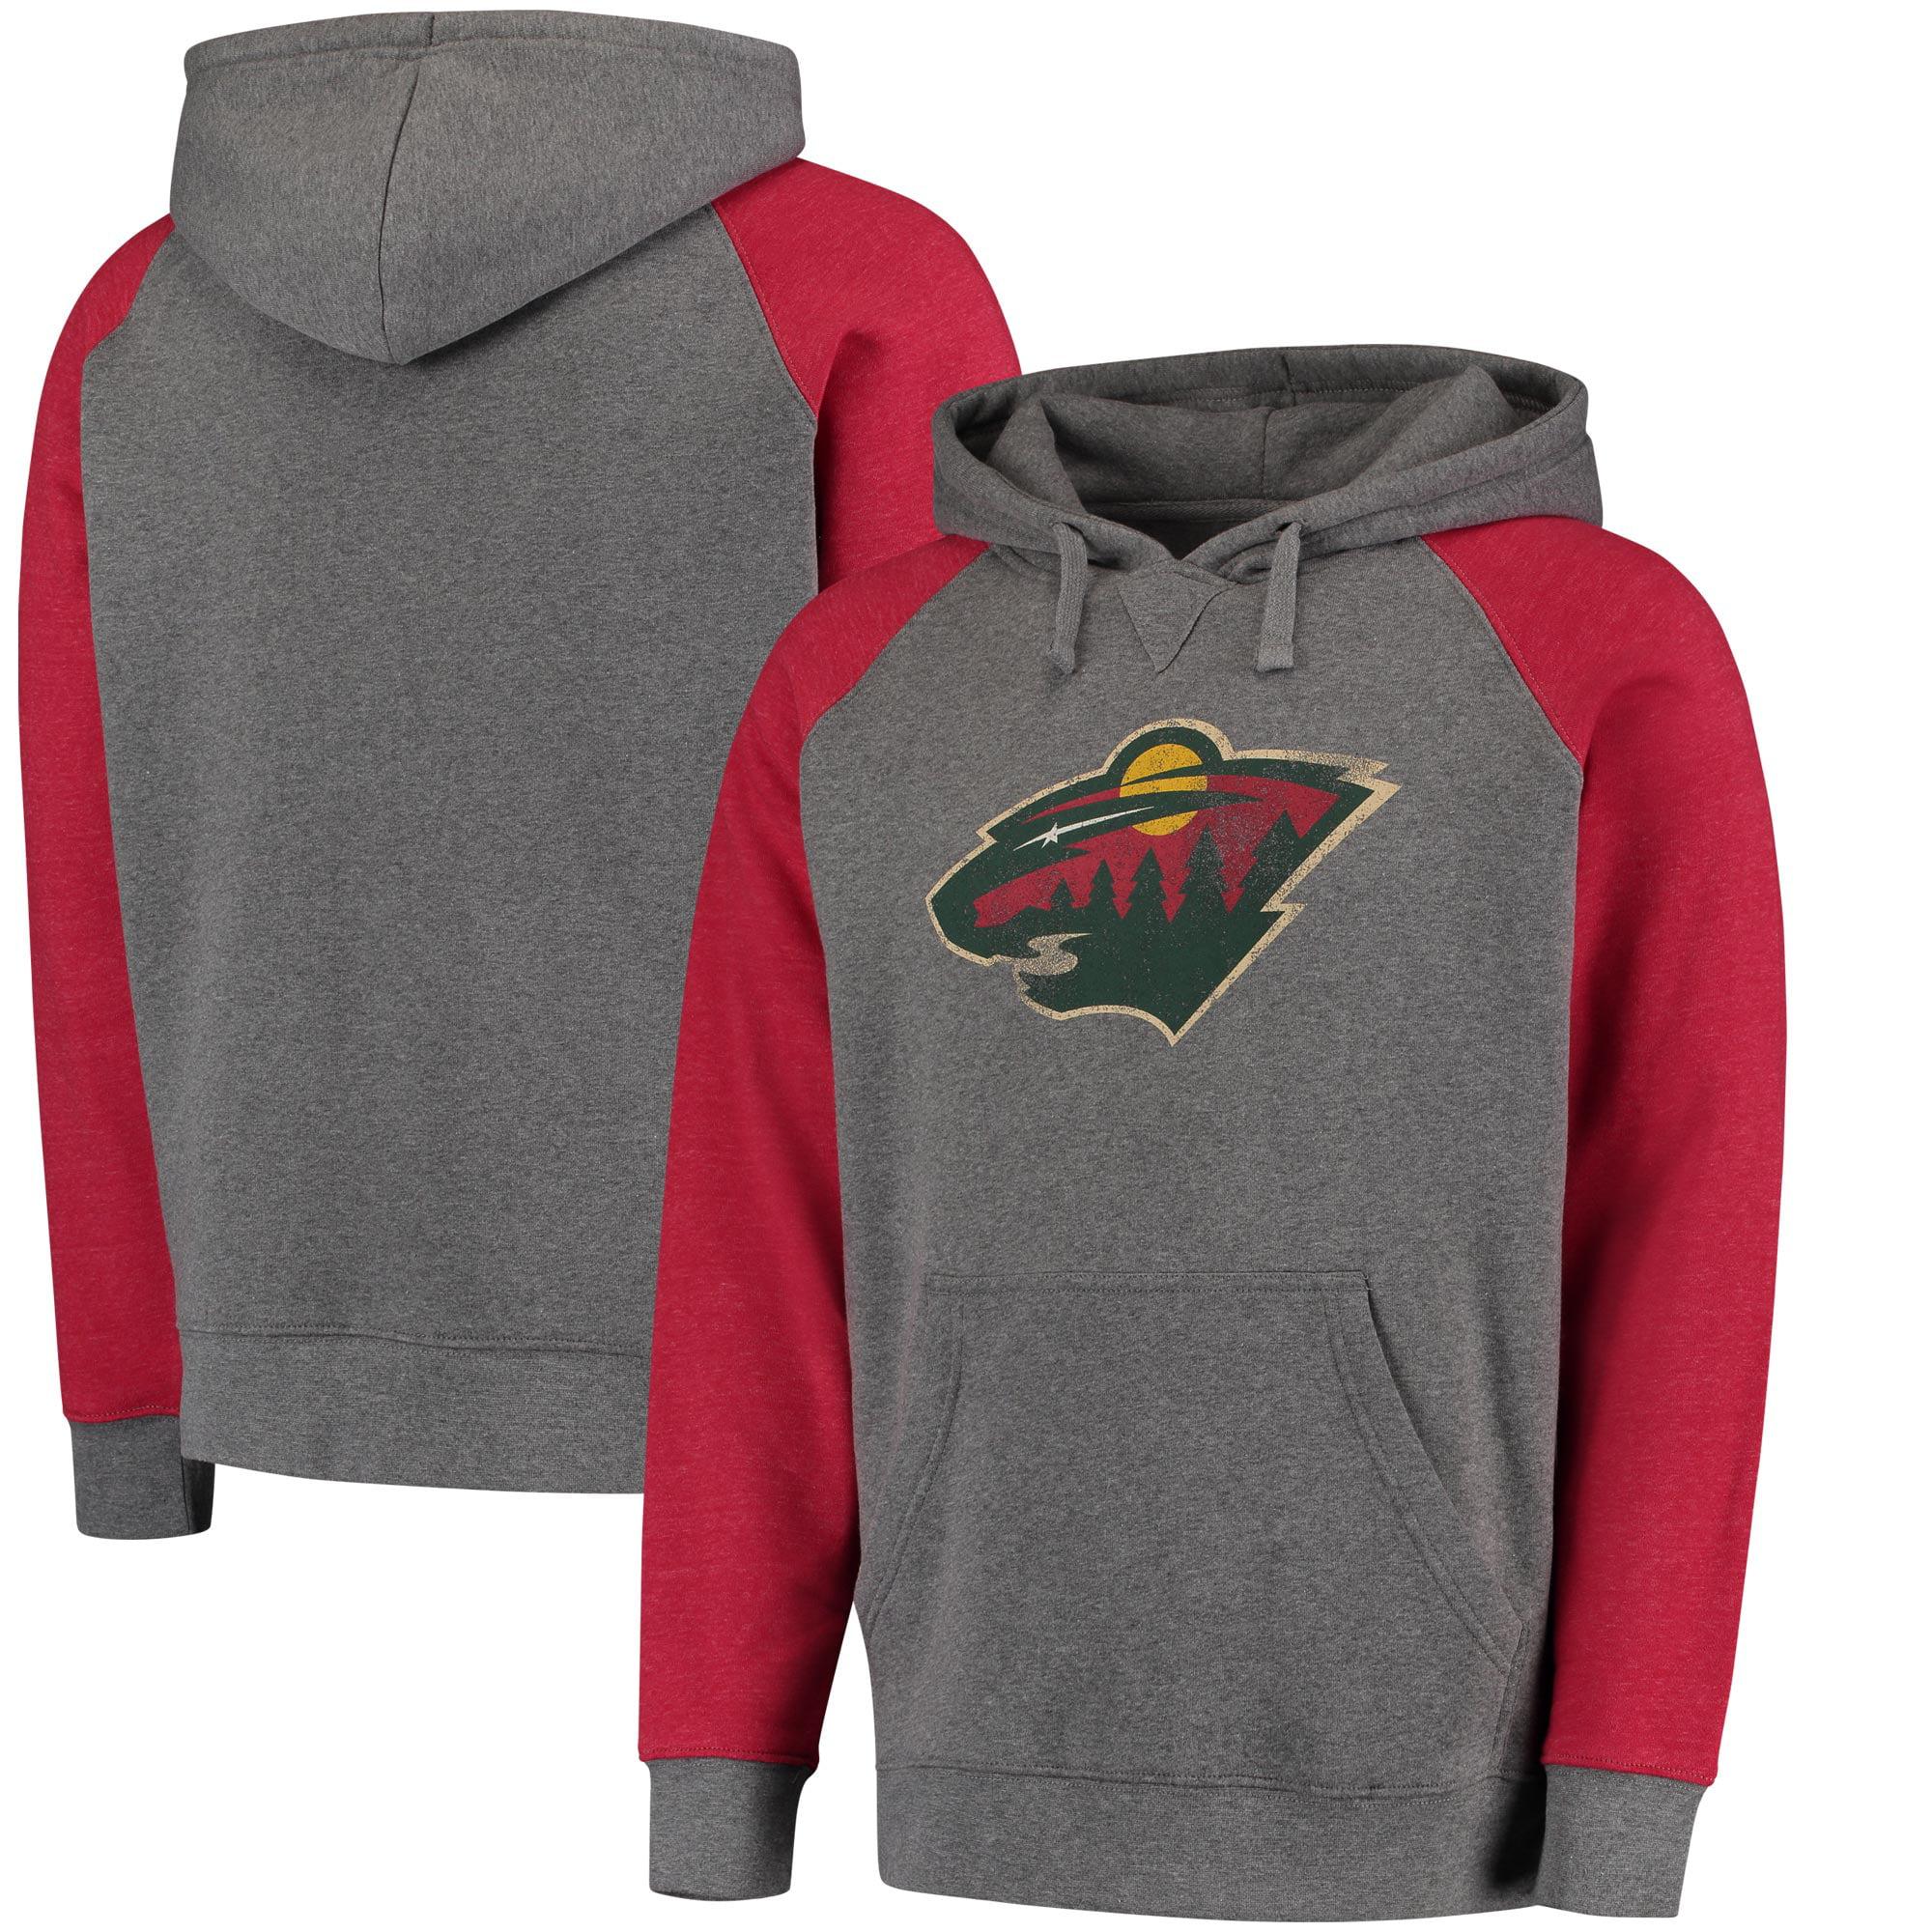 Minnesota Wild Distressed Primary Logo Raglan Tri-Blend Pullover Hoodie - Gray/Red